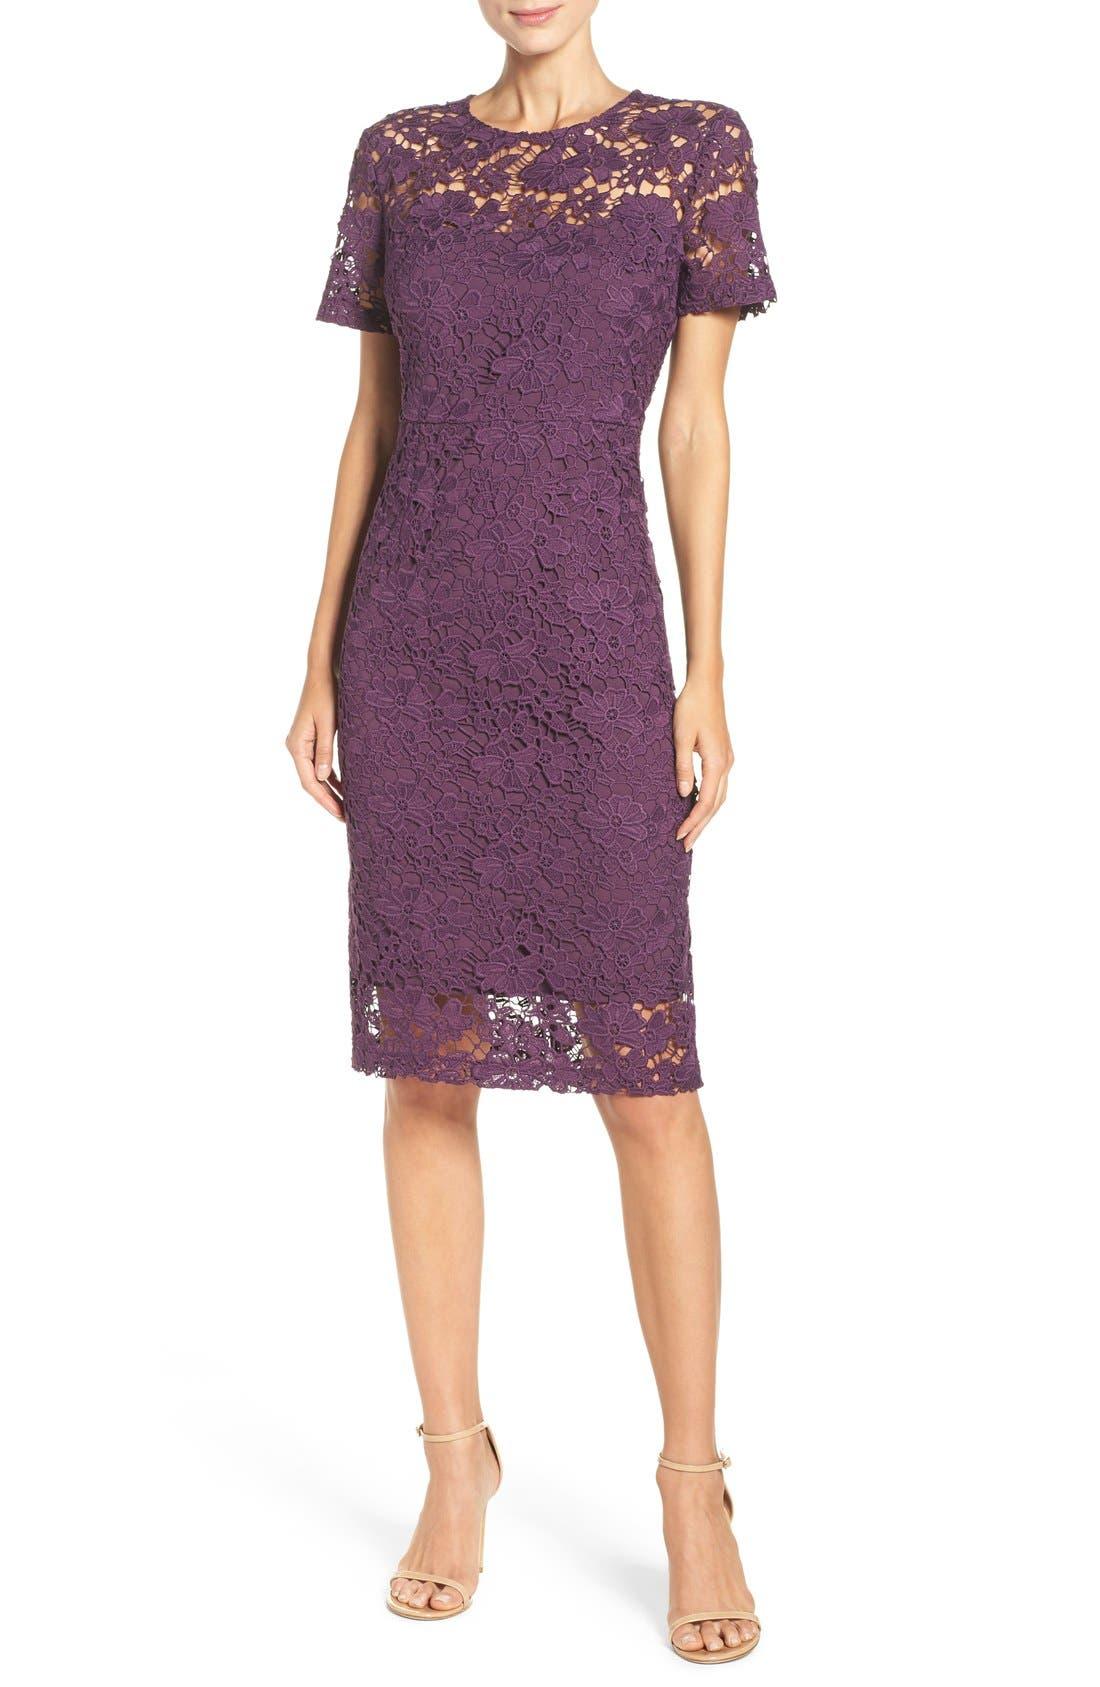 Alternate Image 1 Selected - Donna Morgan Lace Sheath Dress (Regular & Petite)